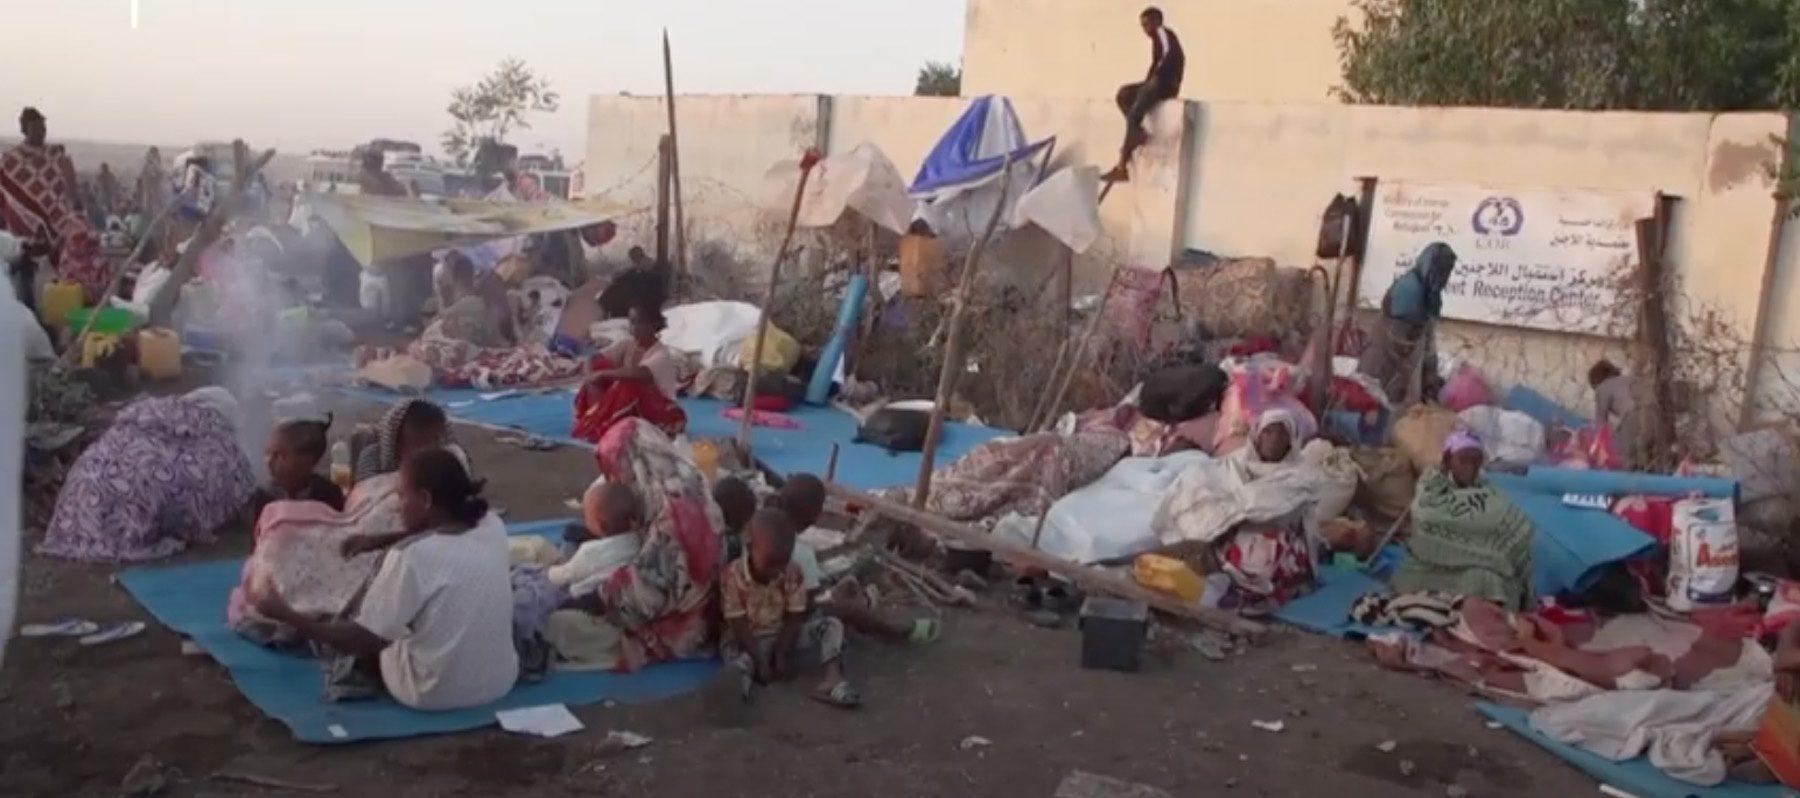 Camp de réfugiés en Ethiopie